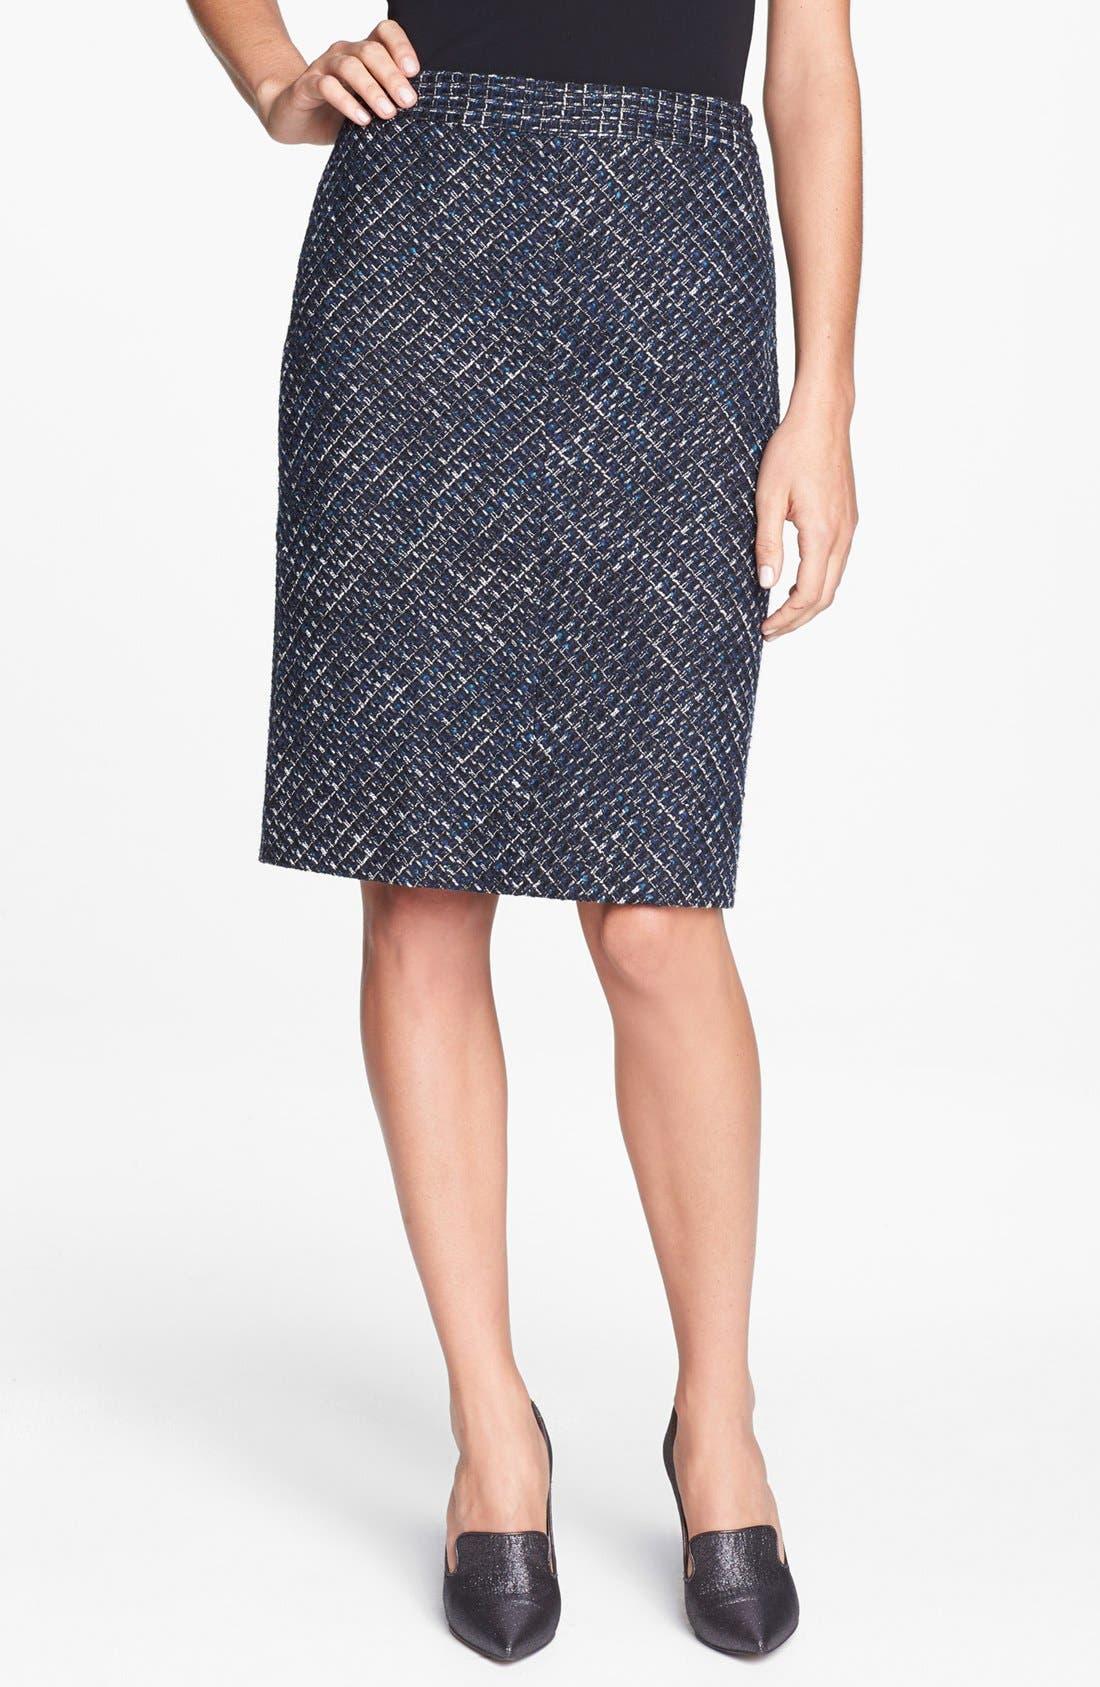 Alternate Image 1 Selected - Classiques Entier® 'Ambra Weave' Skirt